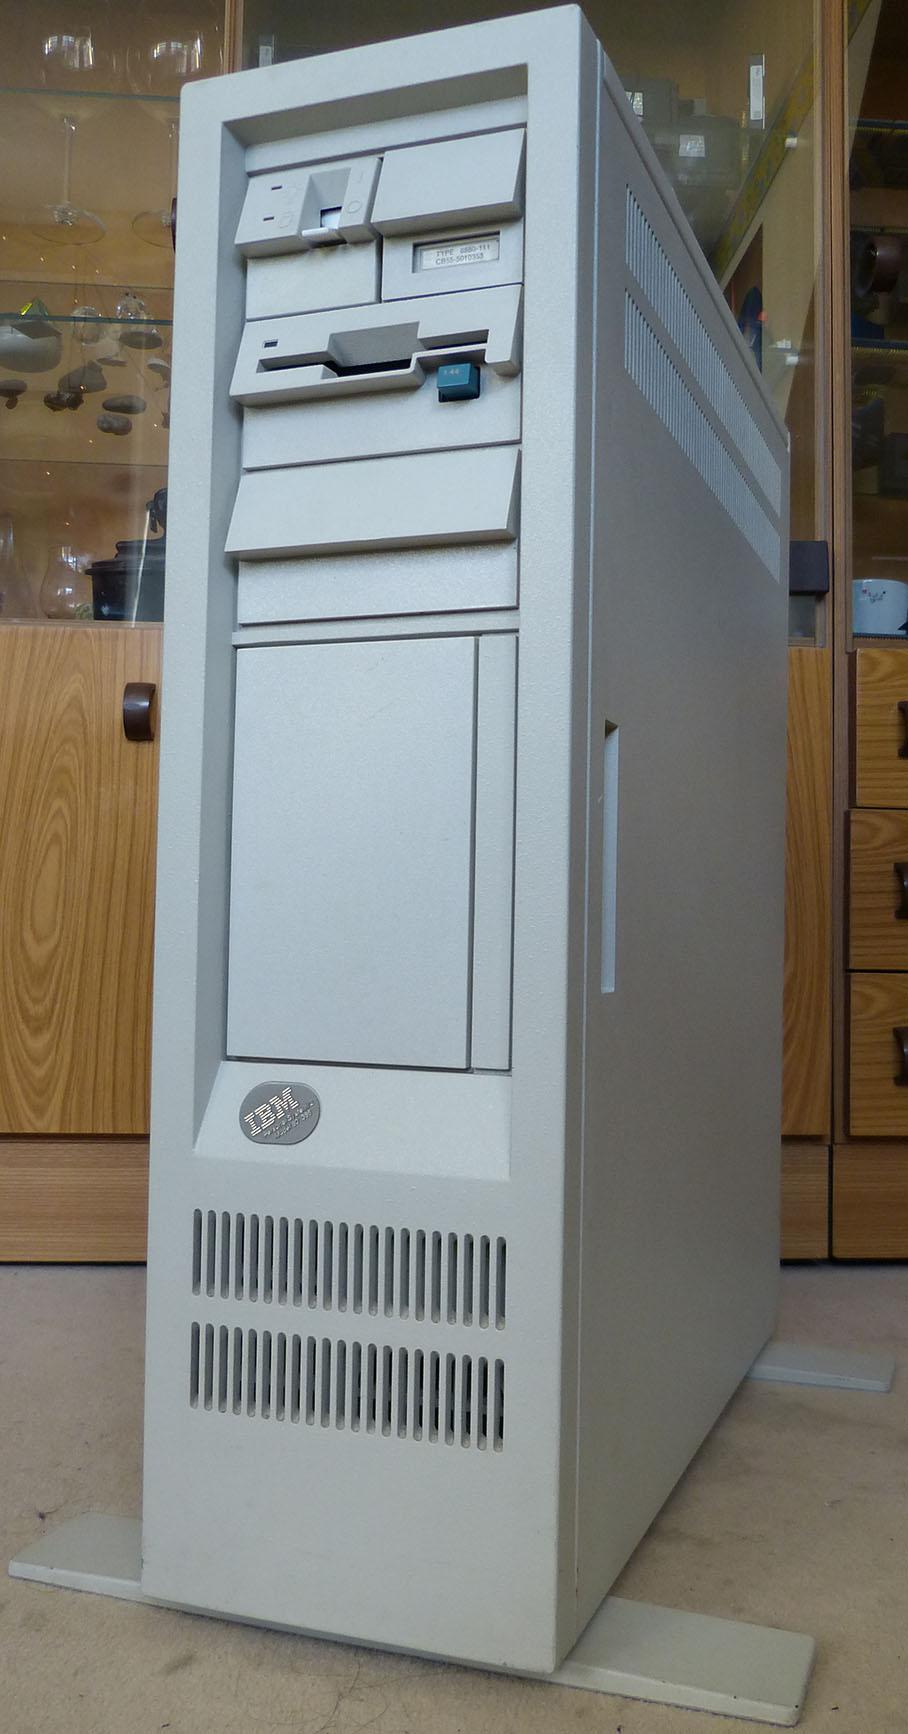 IBM_PS2_front.jpg